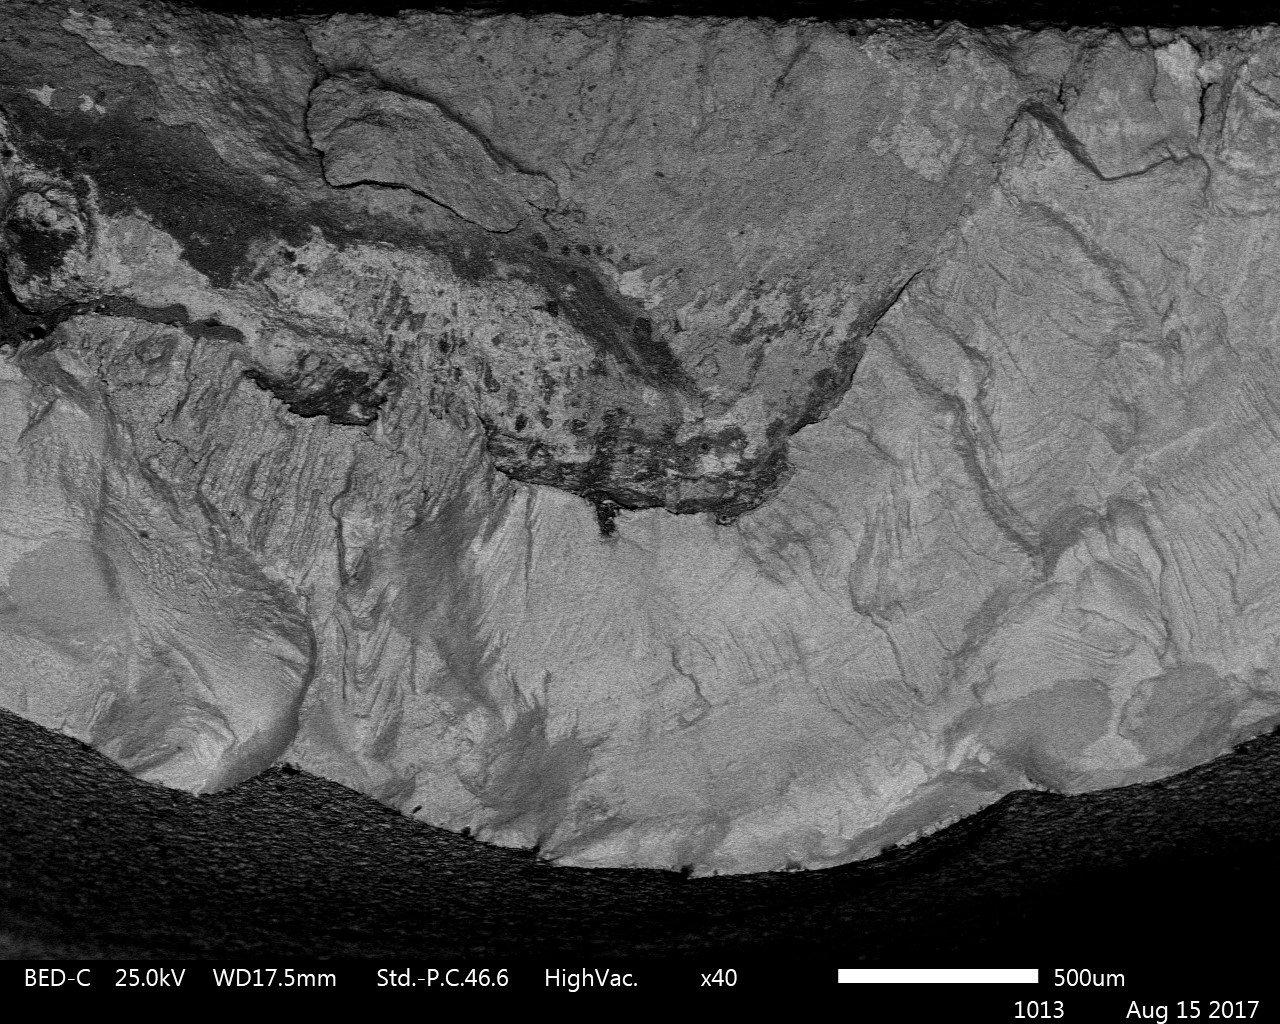 Backscatter image showing scale location on sample